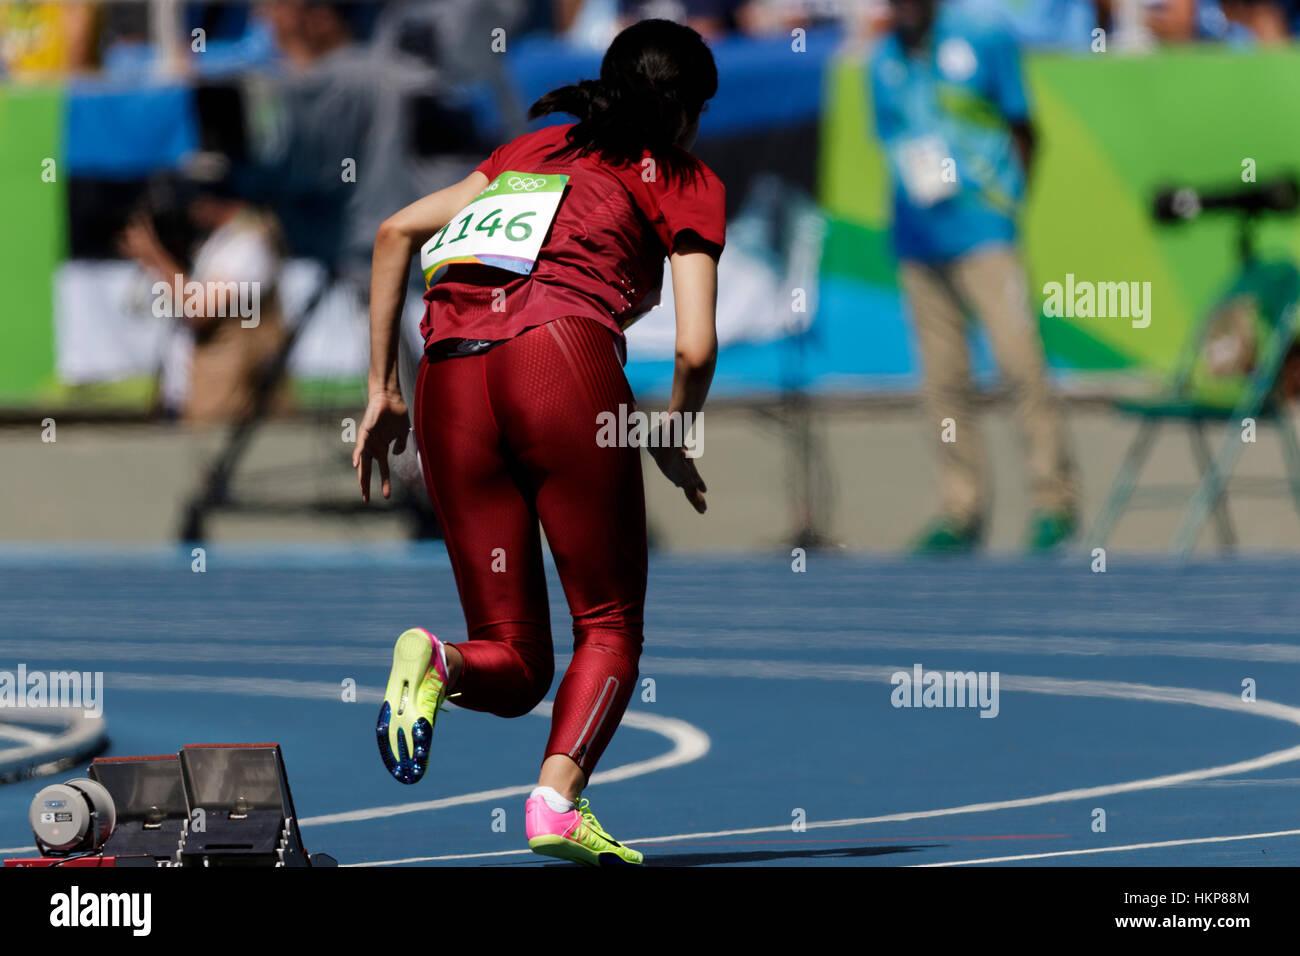 Rio de Janeiro, Brazil. 13 August 2016.  Athletics, Women  starting 400m  heats at the 2016 Olympic Summer Games. - Stock Image